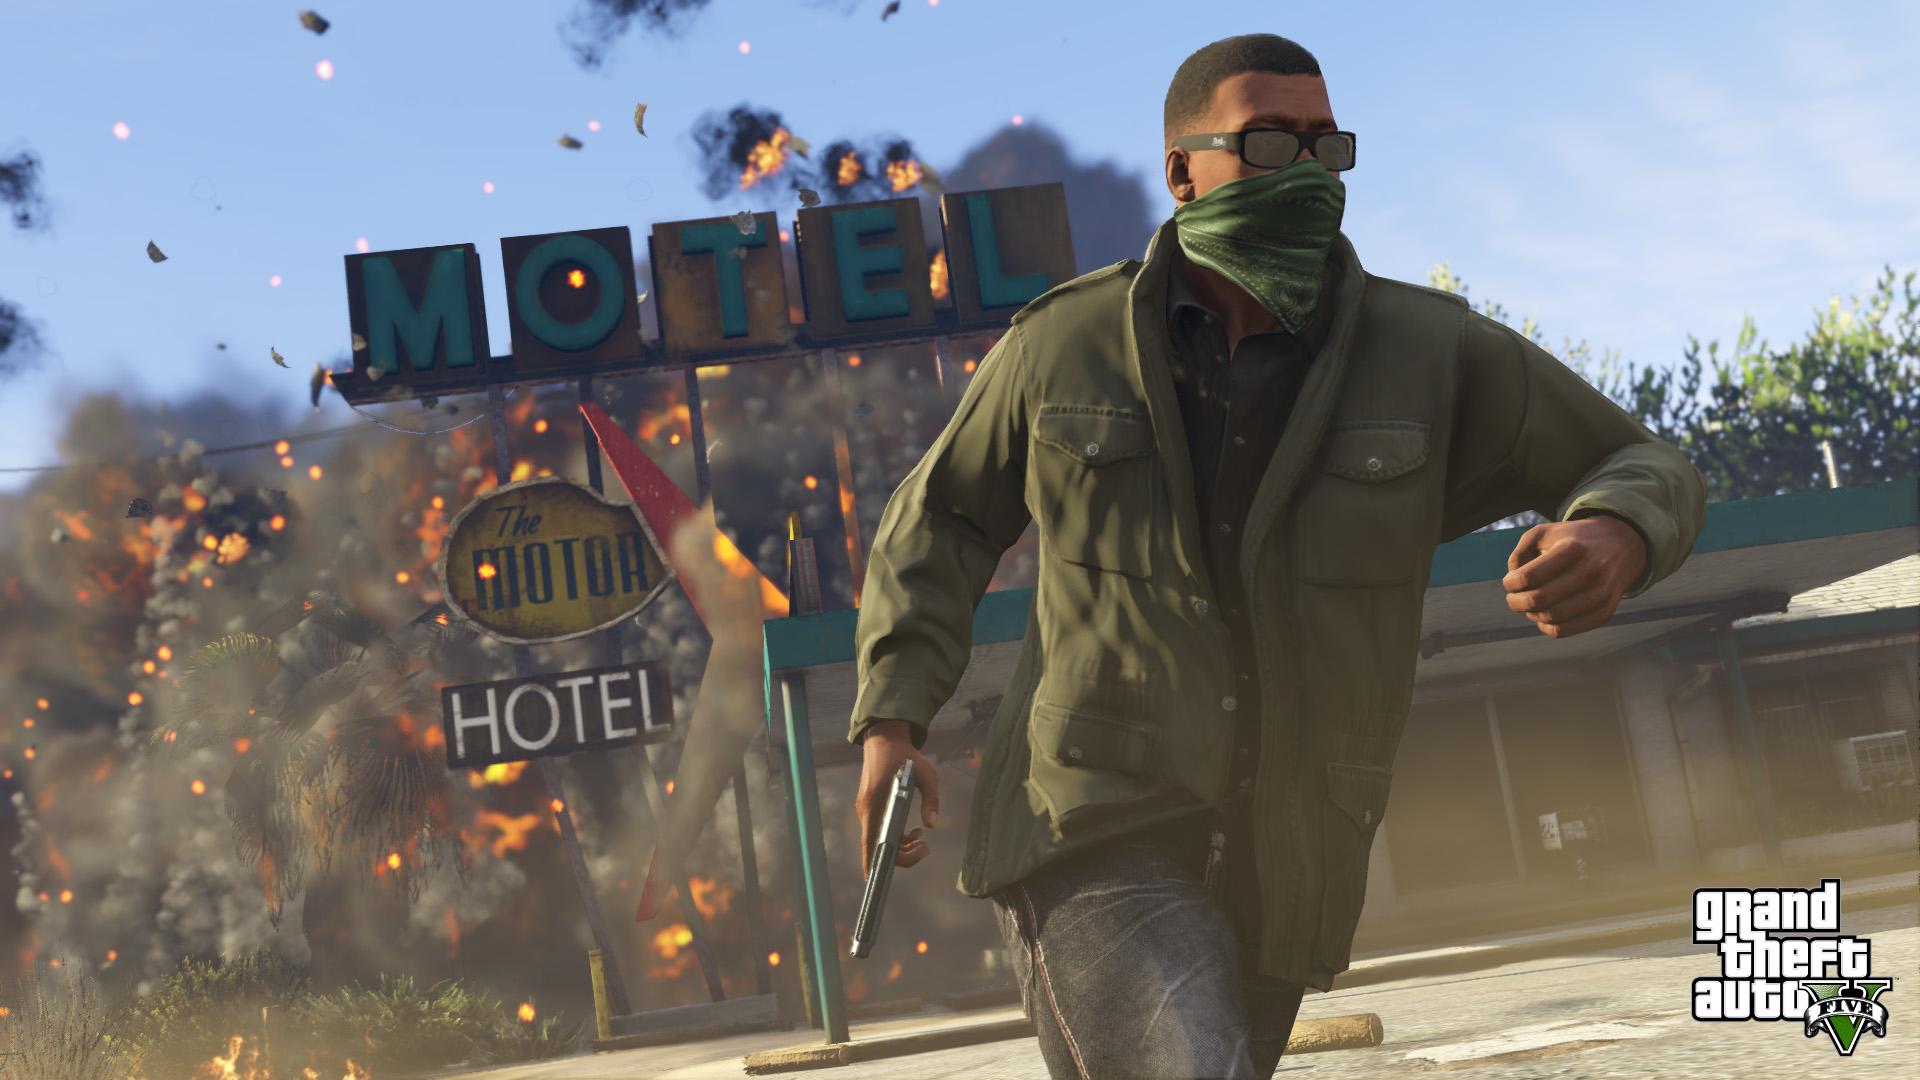 Журналисты снова задали вопрос Take-Two о выходе сюжетного DLC для GTA 5